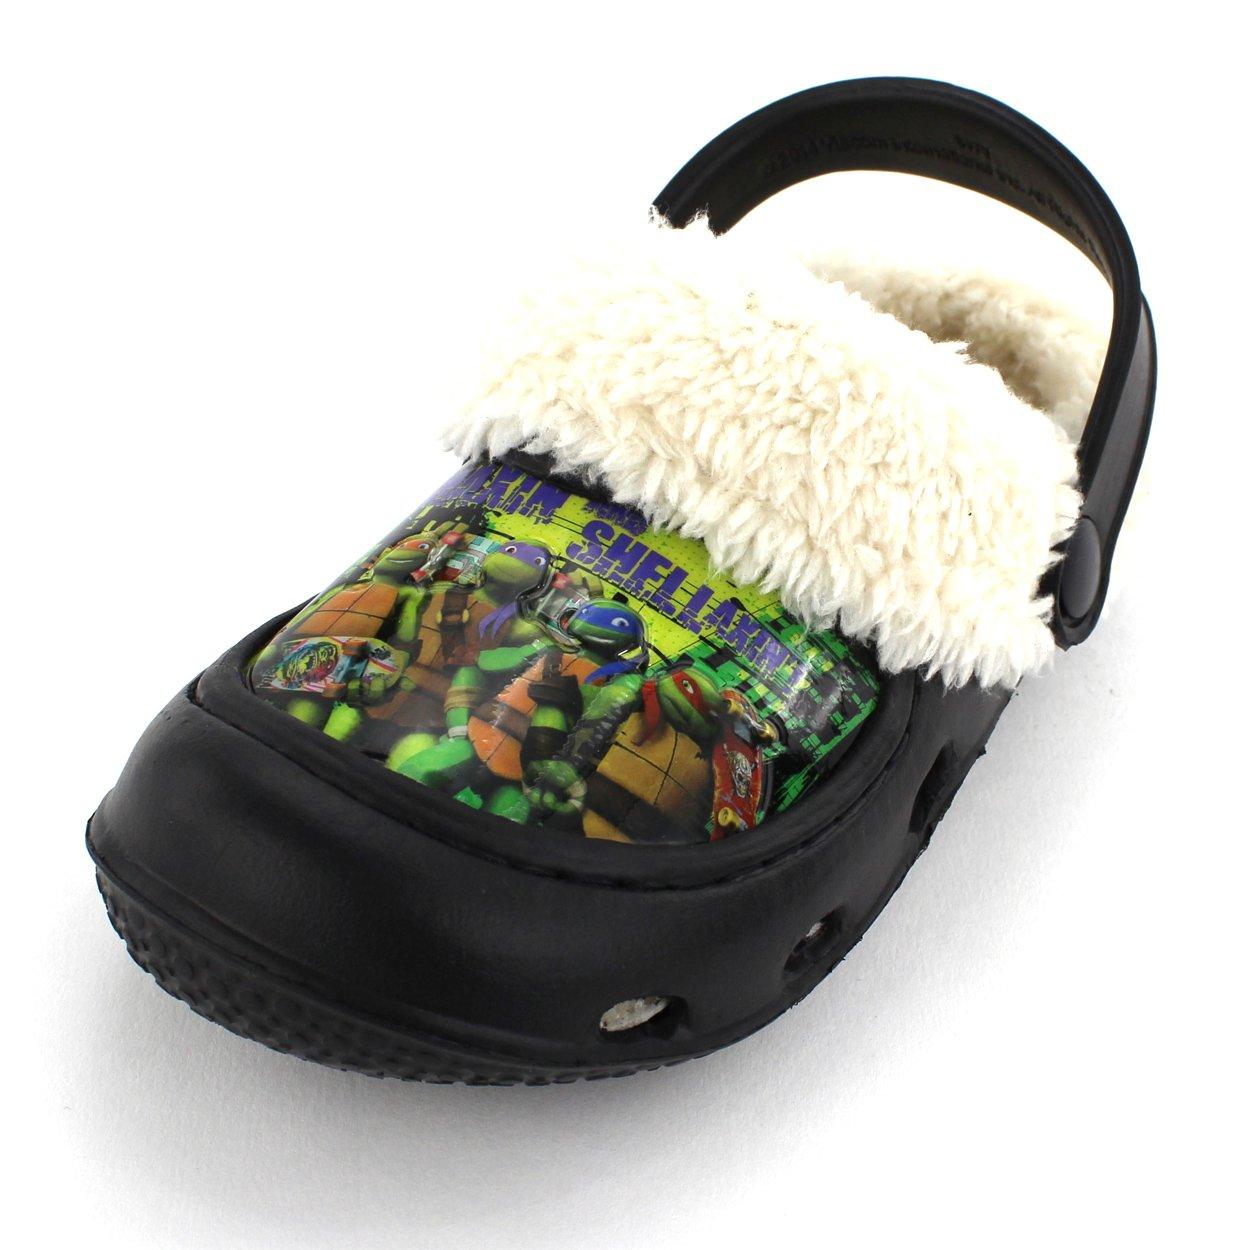 Nickelodeon TMNT Ninja Turtles Boys Black Fleece Lined Clogs (Toddler)